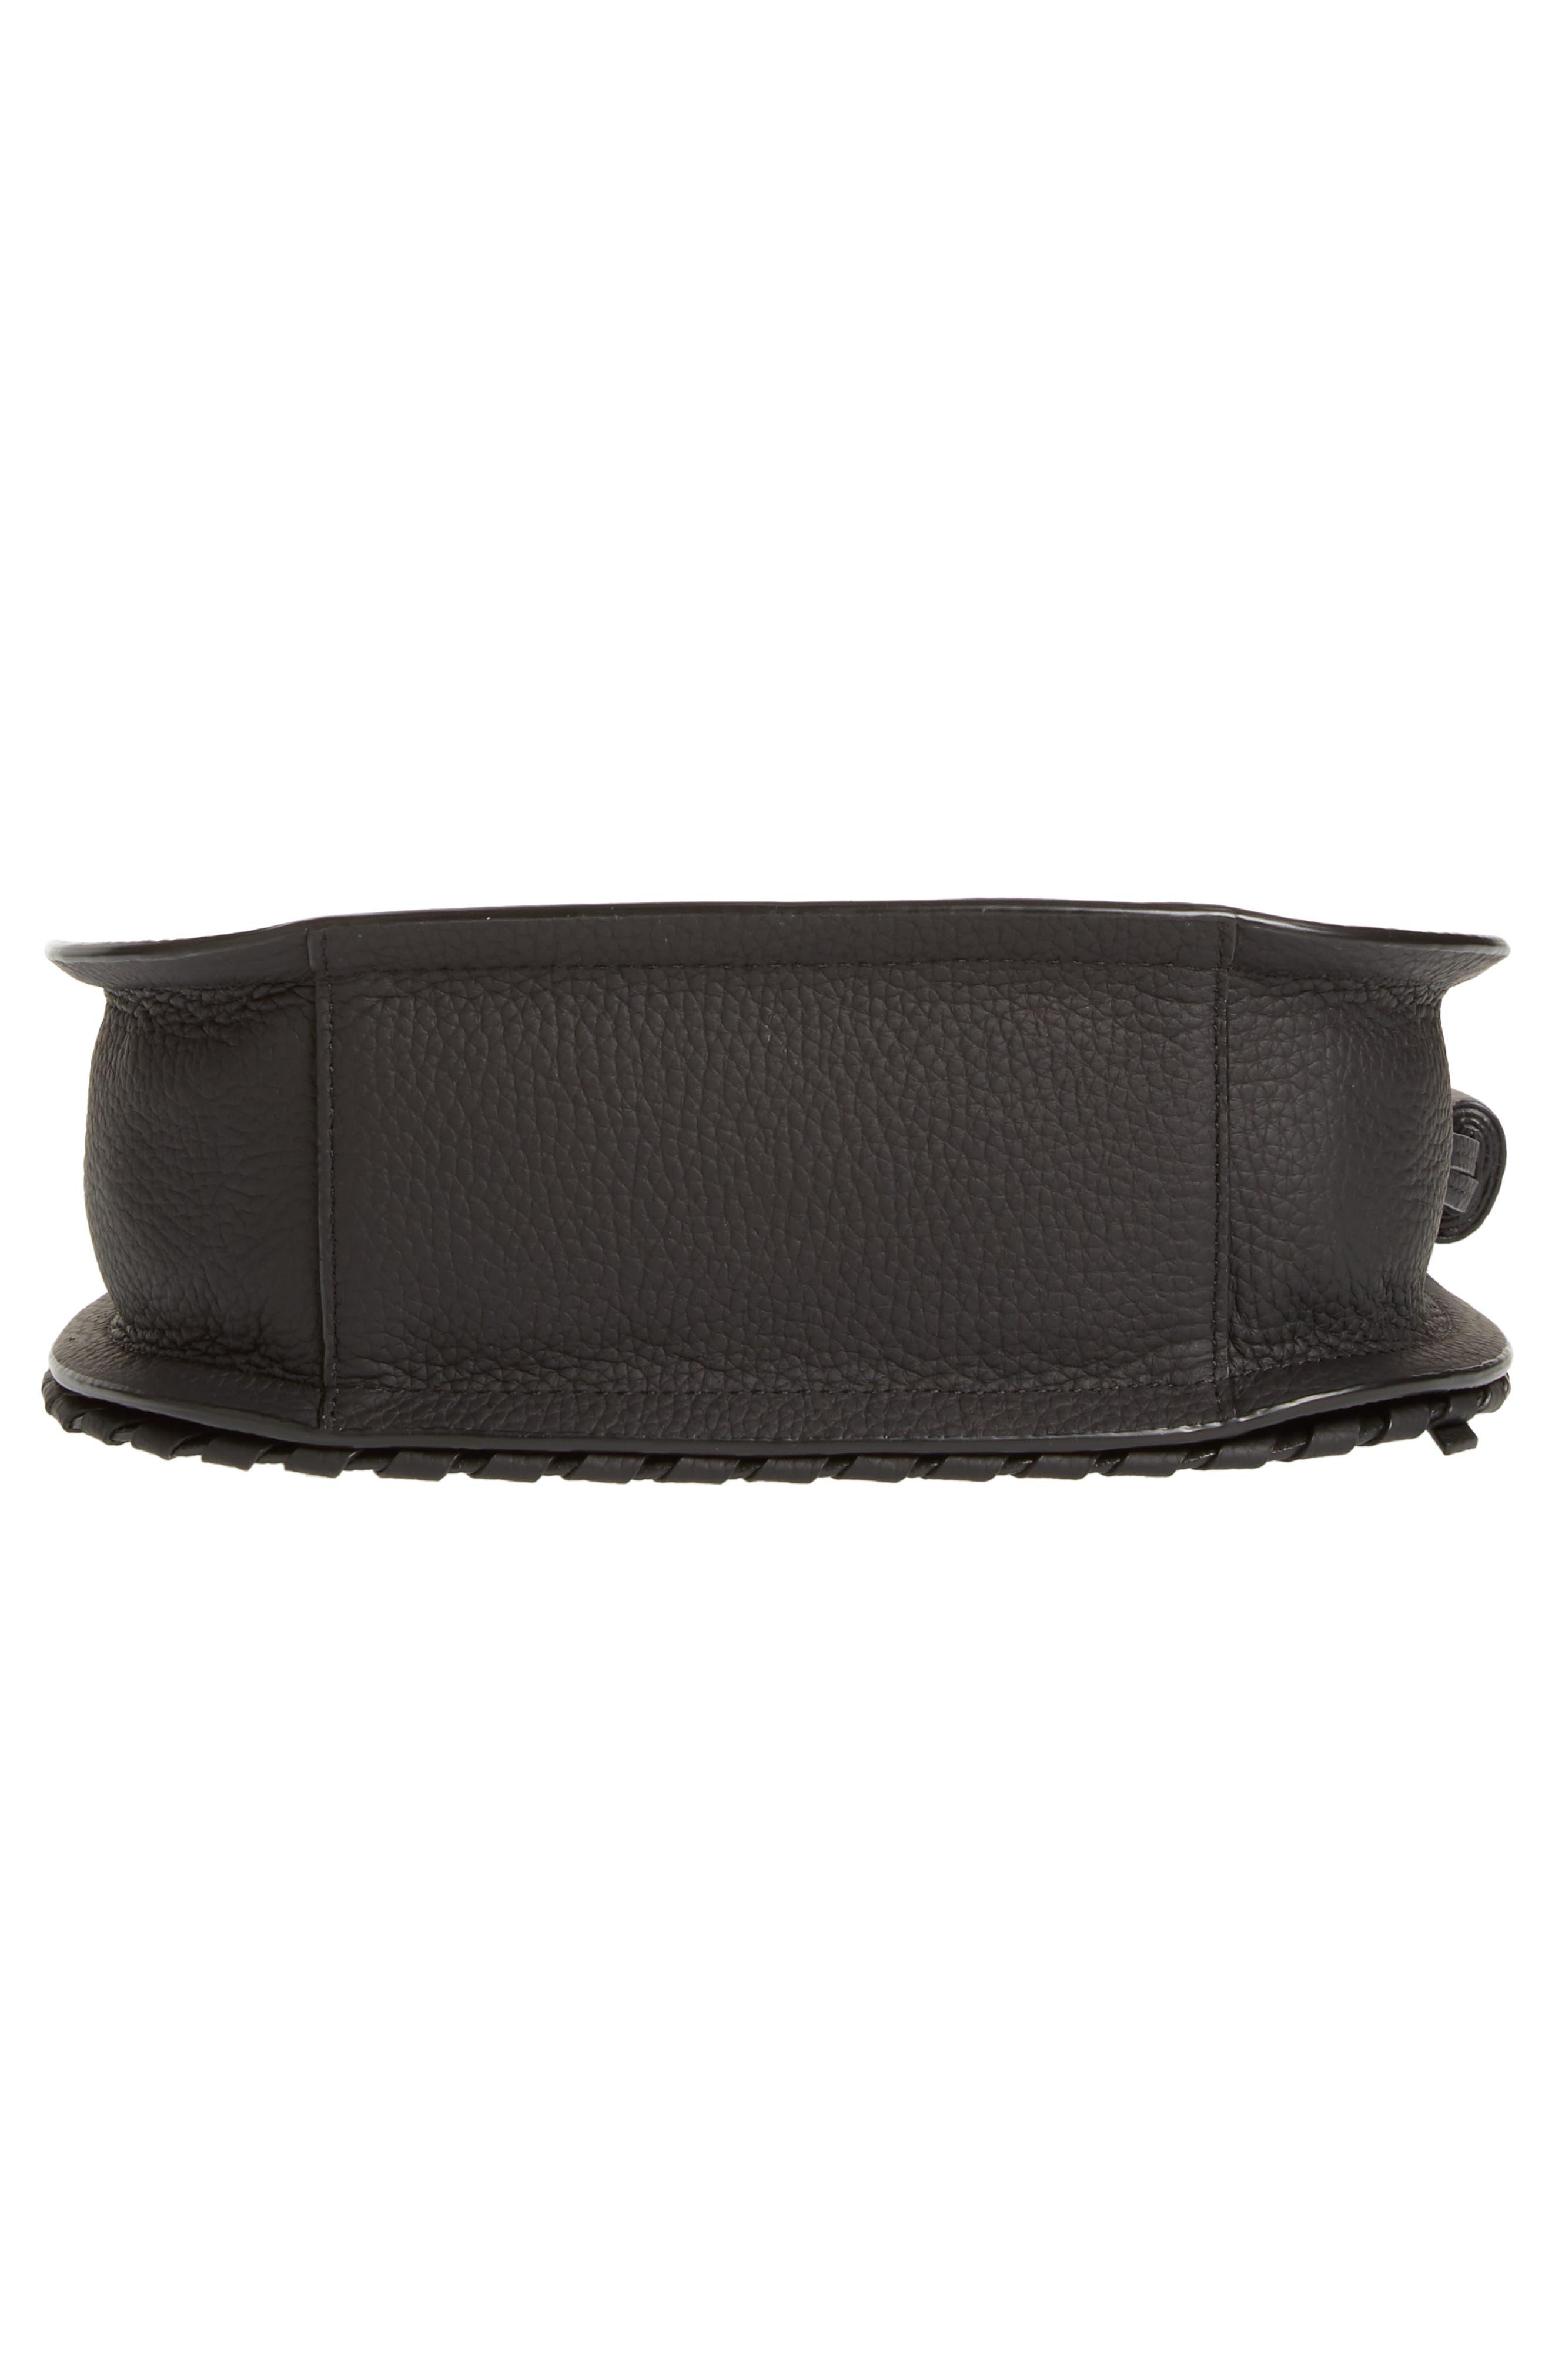 Mori Leather Crossbody Bag,                             Alternate thumbnail 6, color,                             BLACK